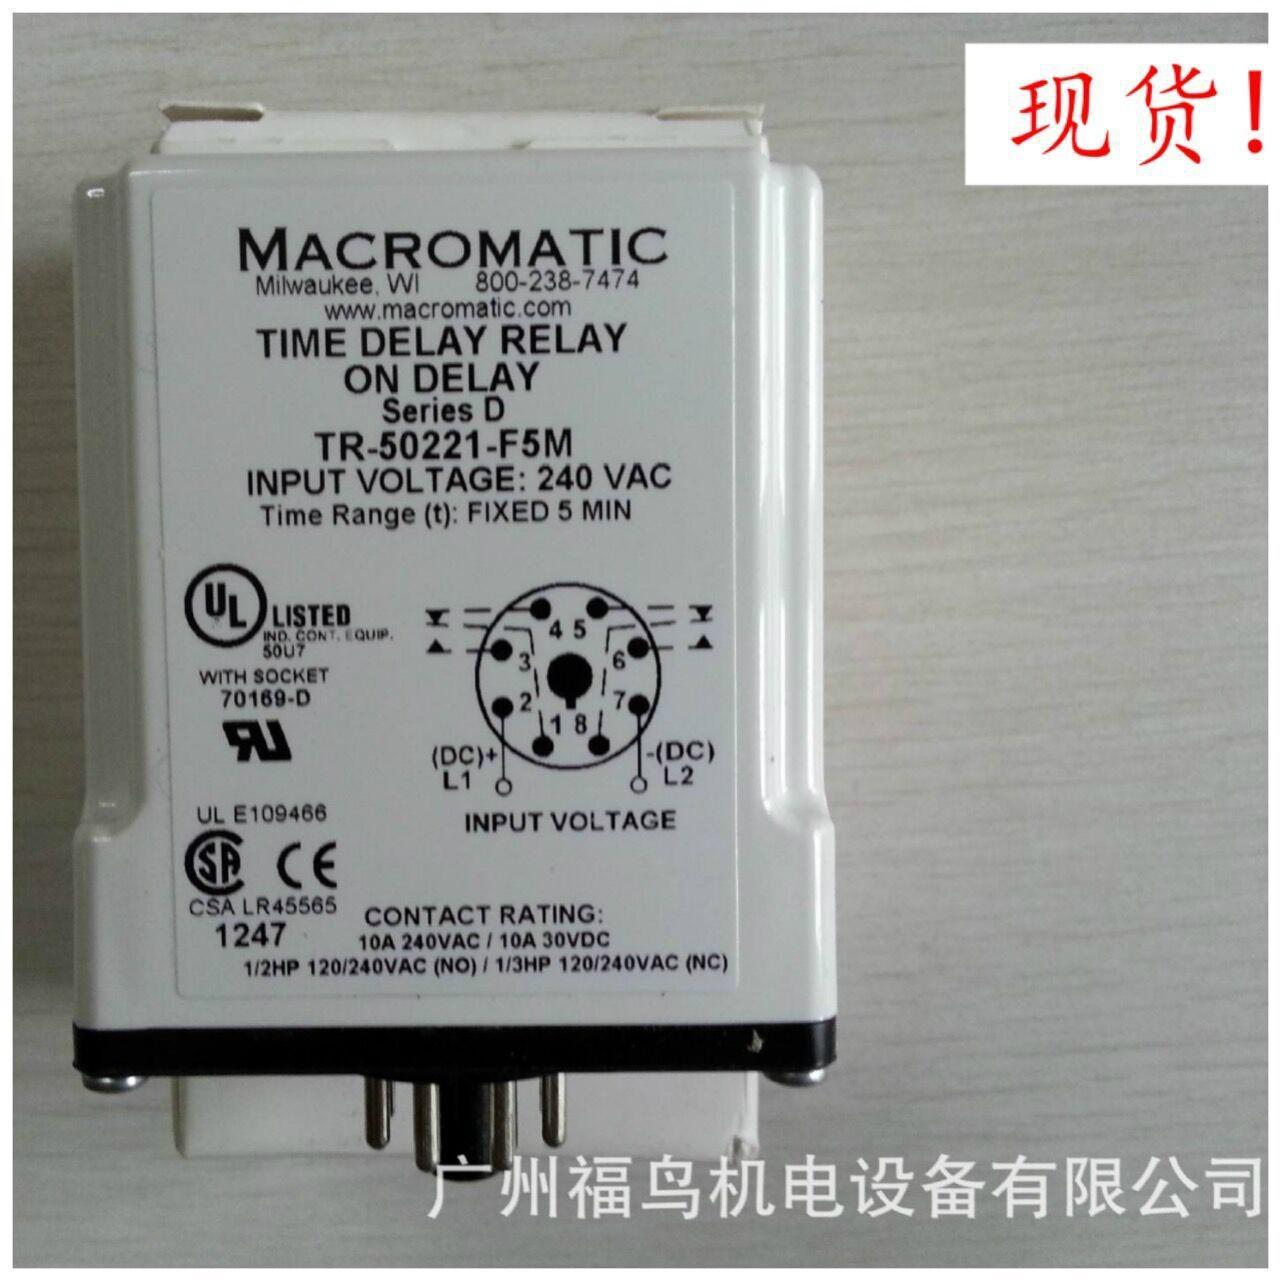 MACROMATIC延时继电器, 型号: TR-50221-F5M